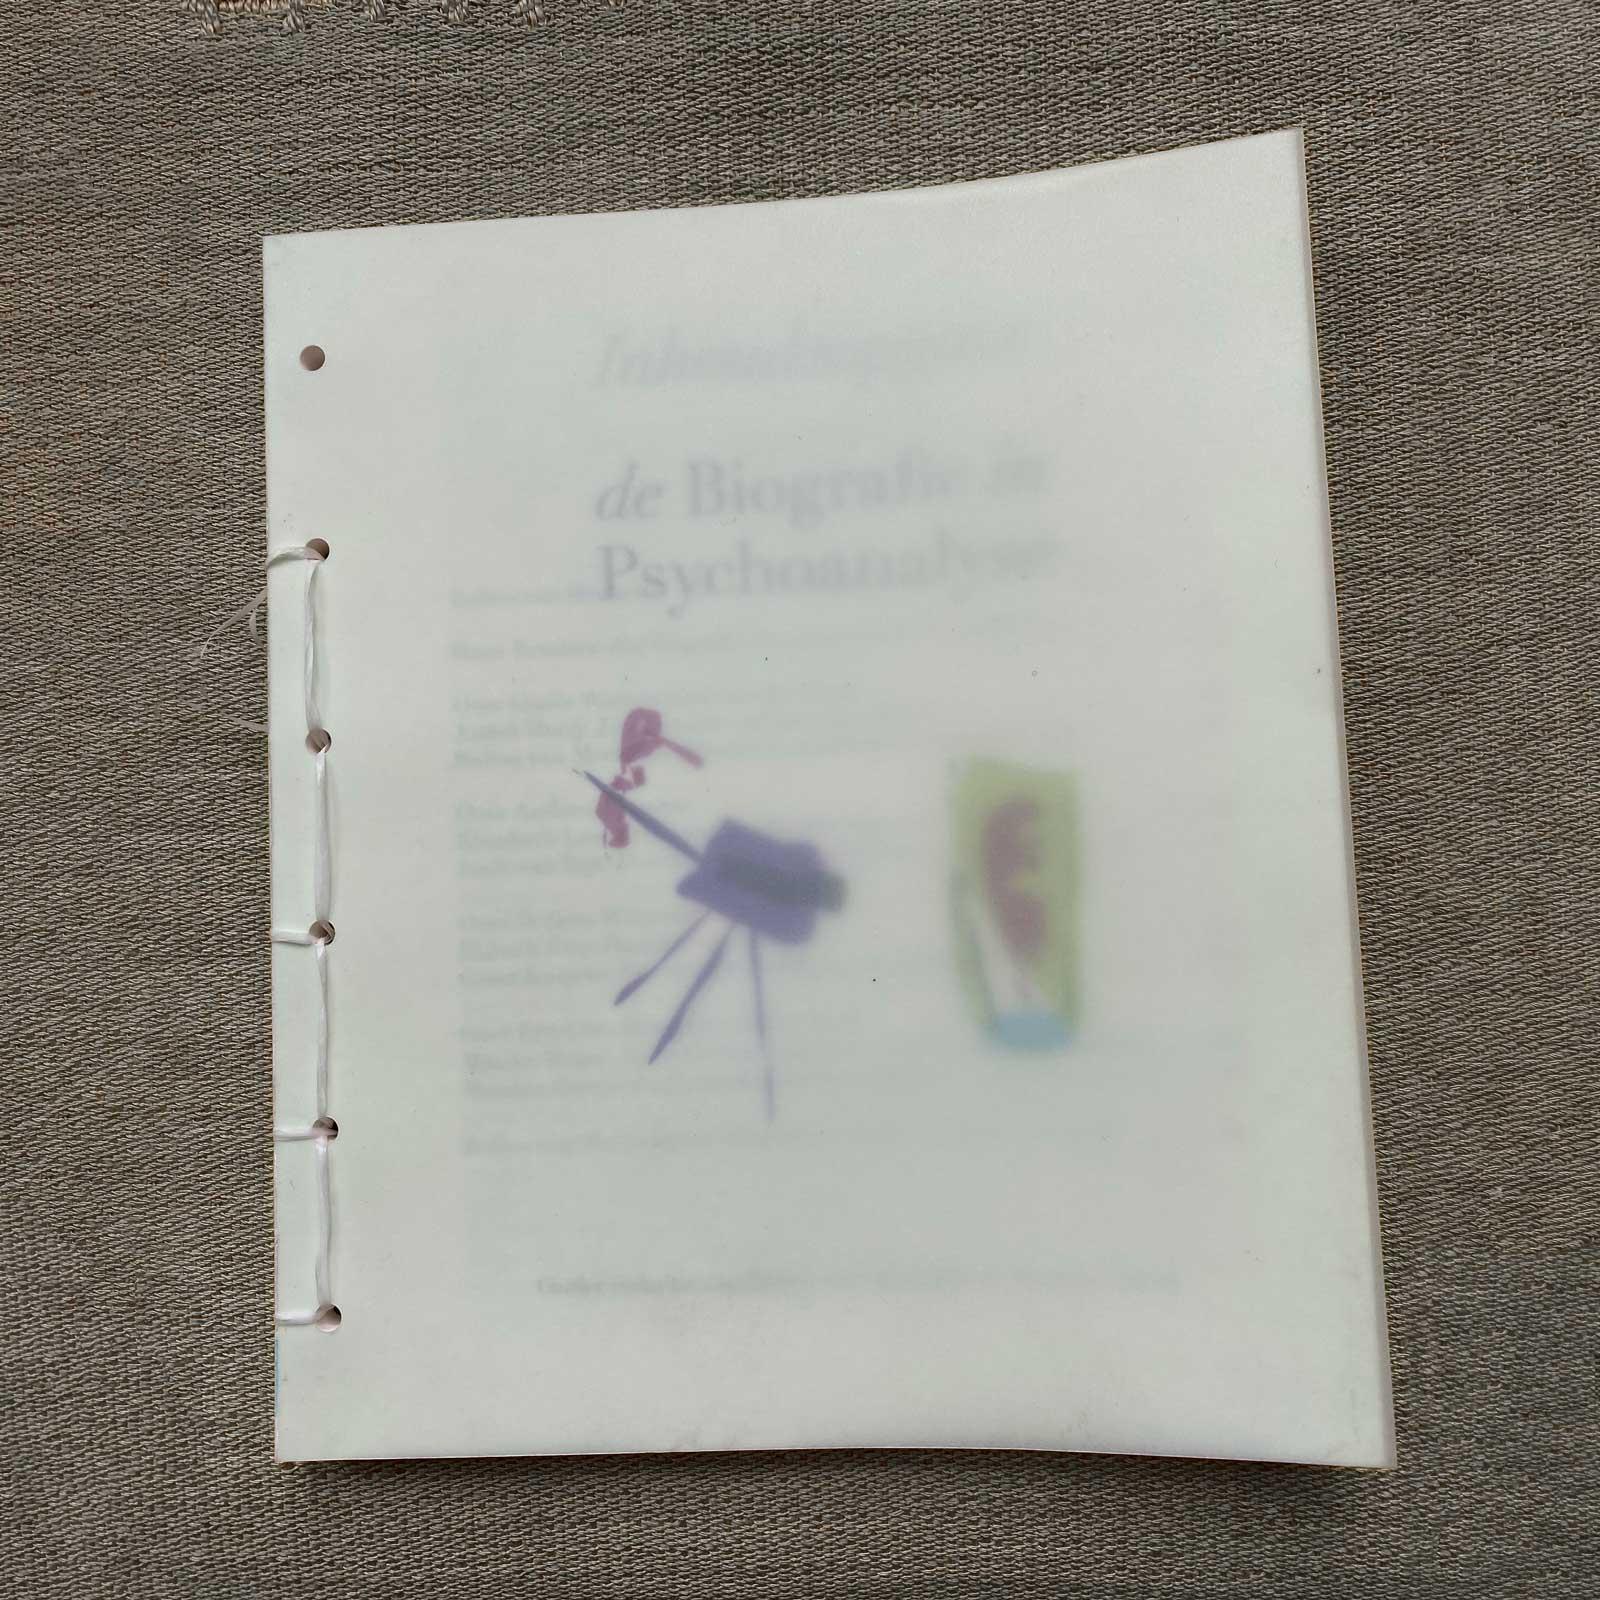 omslag boek Biografie in Psychoanalyse